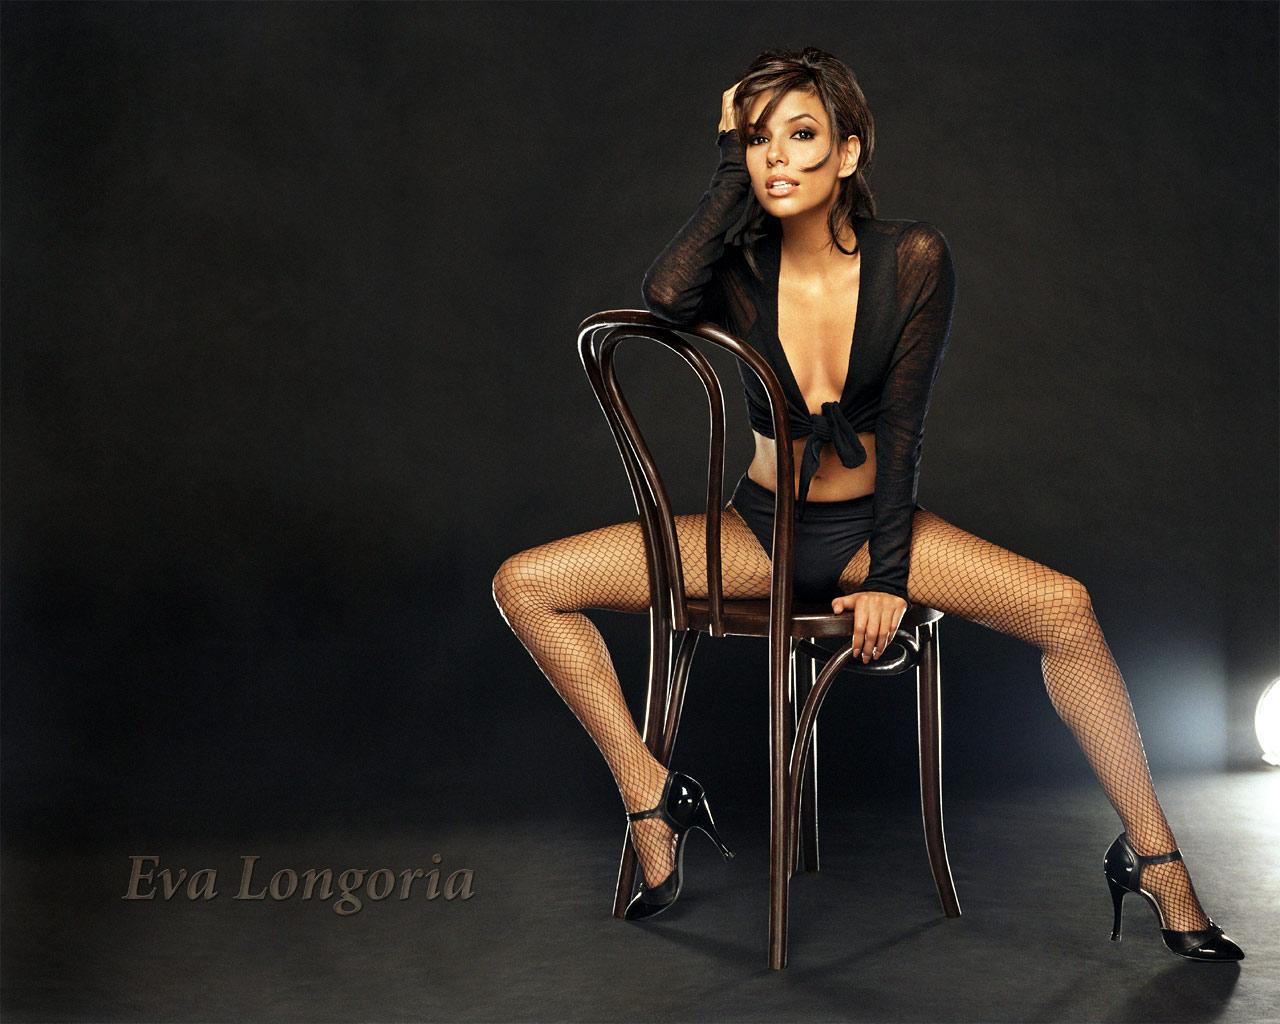 Eva longoria sexy photo shoot 4